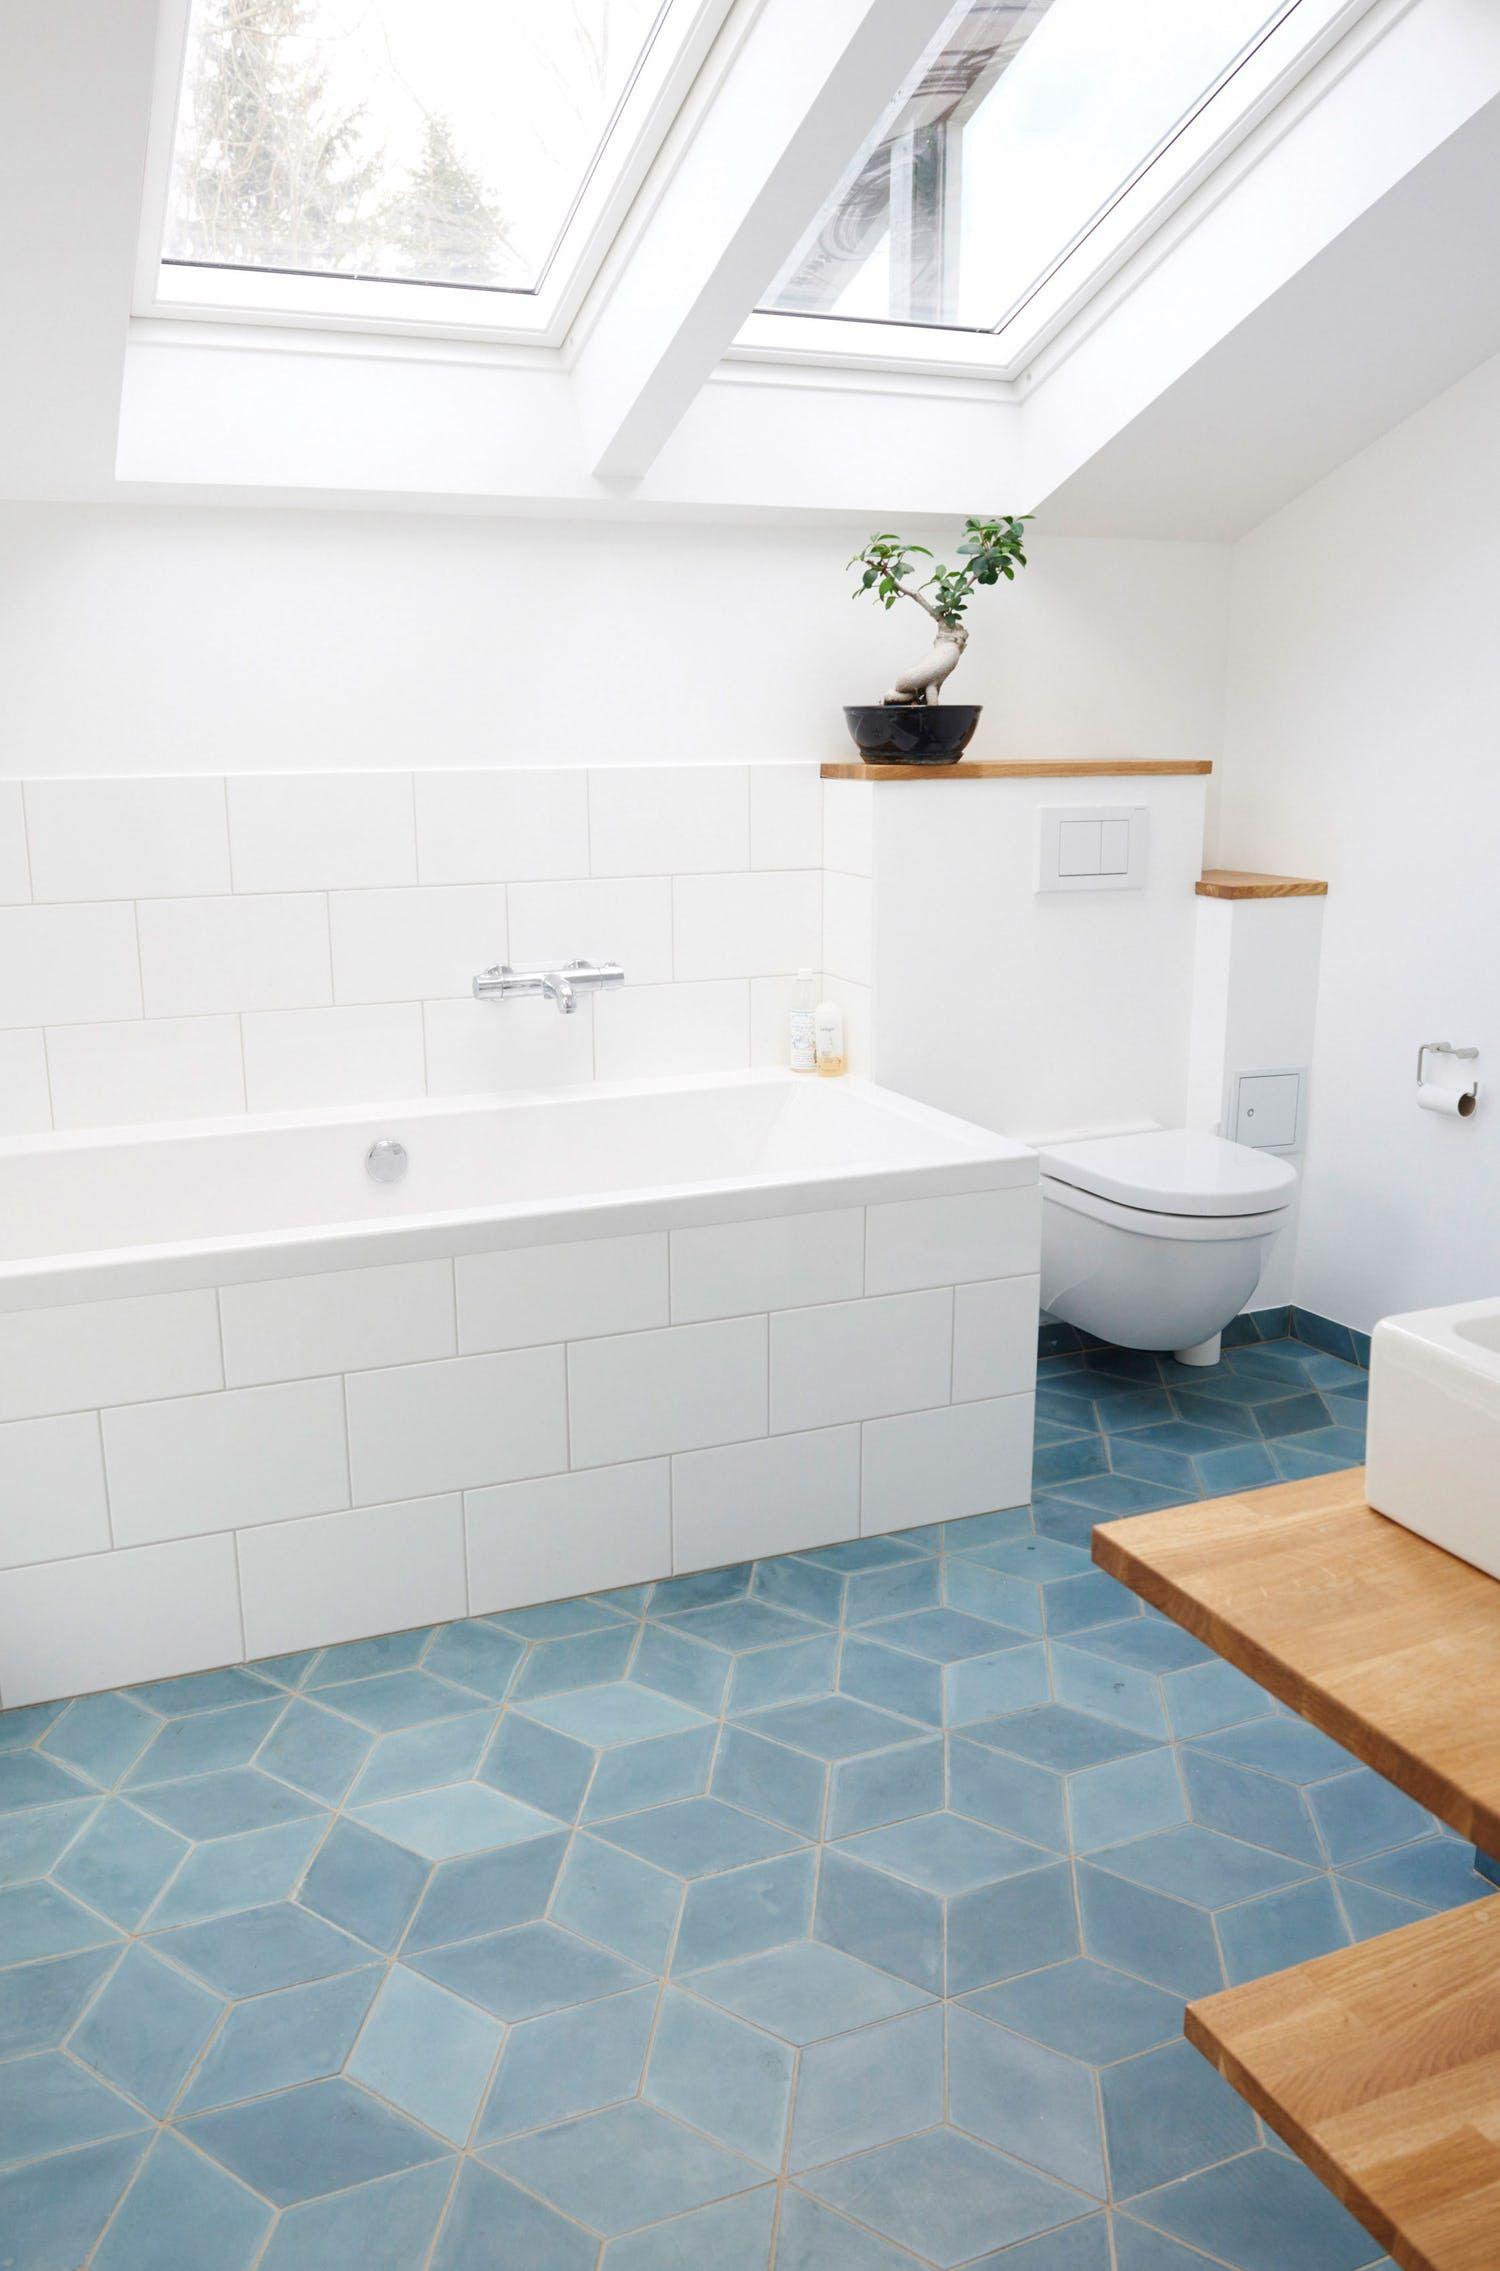 Marokkansk Inspiration Blue Bathroom Tiles Skylight Colourful Morrocan